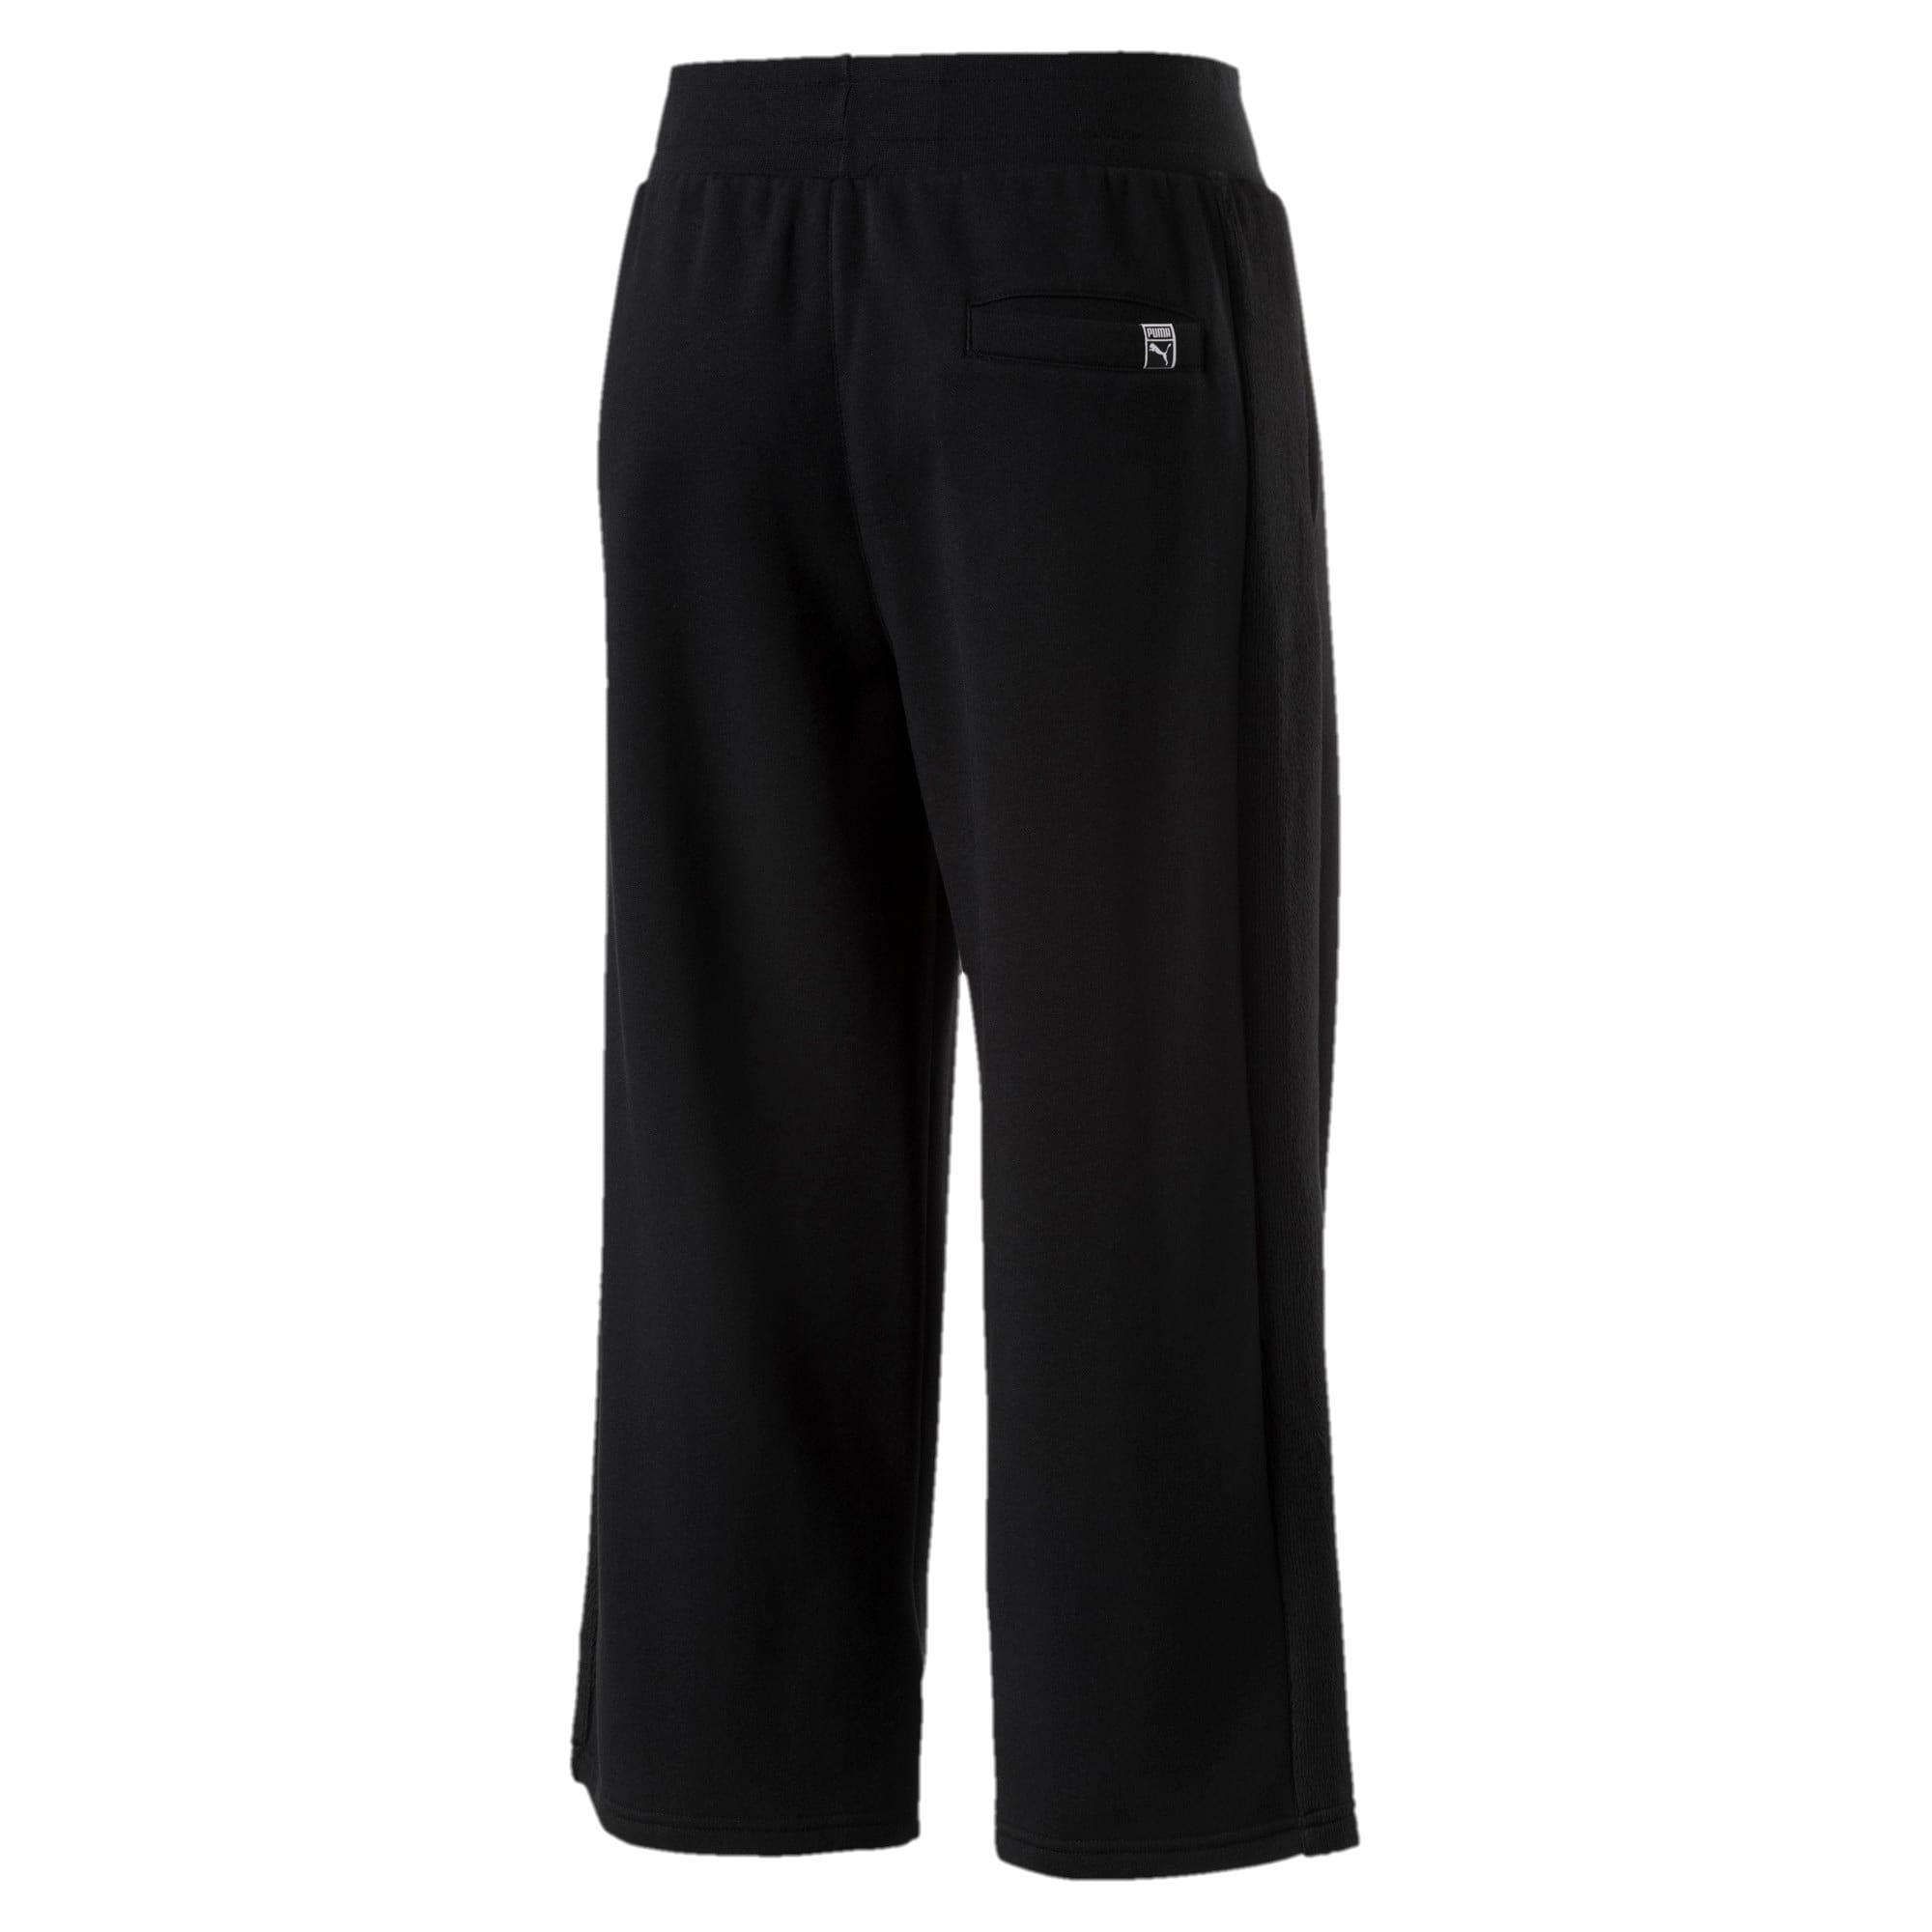 Thumbnail 4 of Classics Women's Winterized Archive Logo T7 Pants, Cotton Black, medium-IND